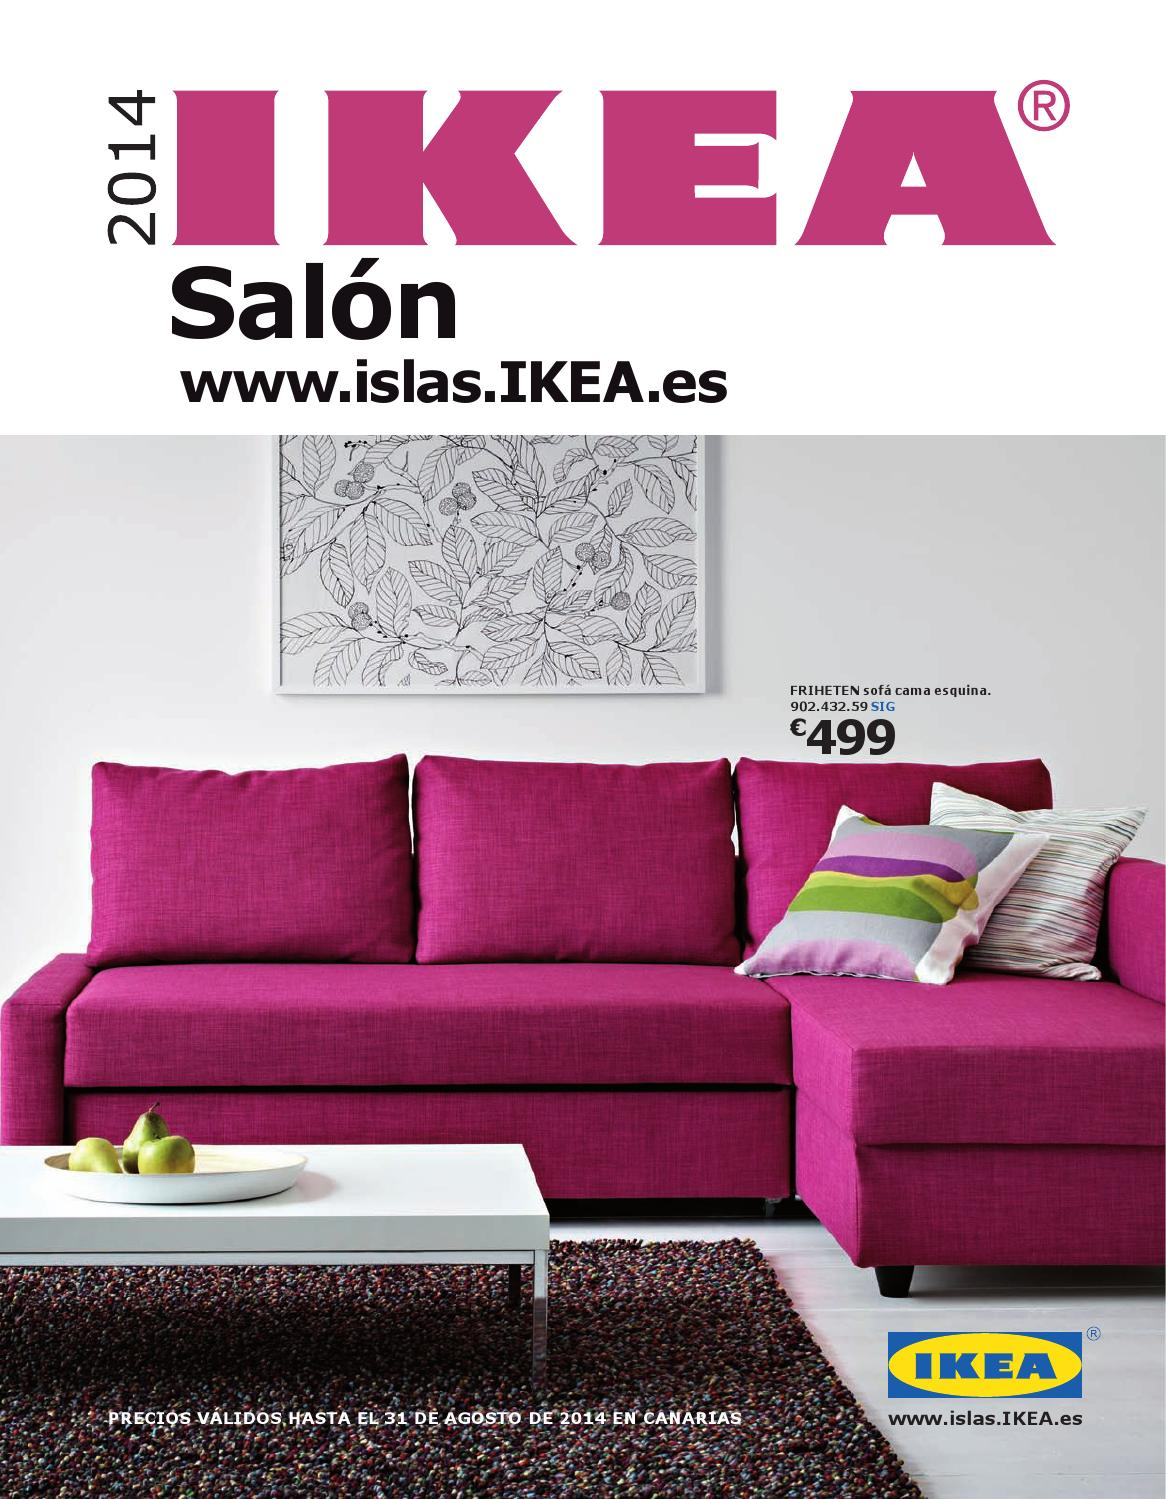 Ikea catalogo sofas cama chaise longue sofa cama consejos para elegir un sof cama tipos y Ikea catalogo sofas cama